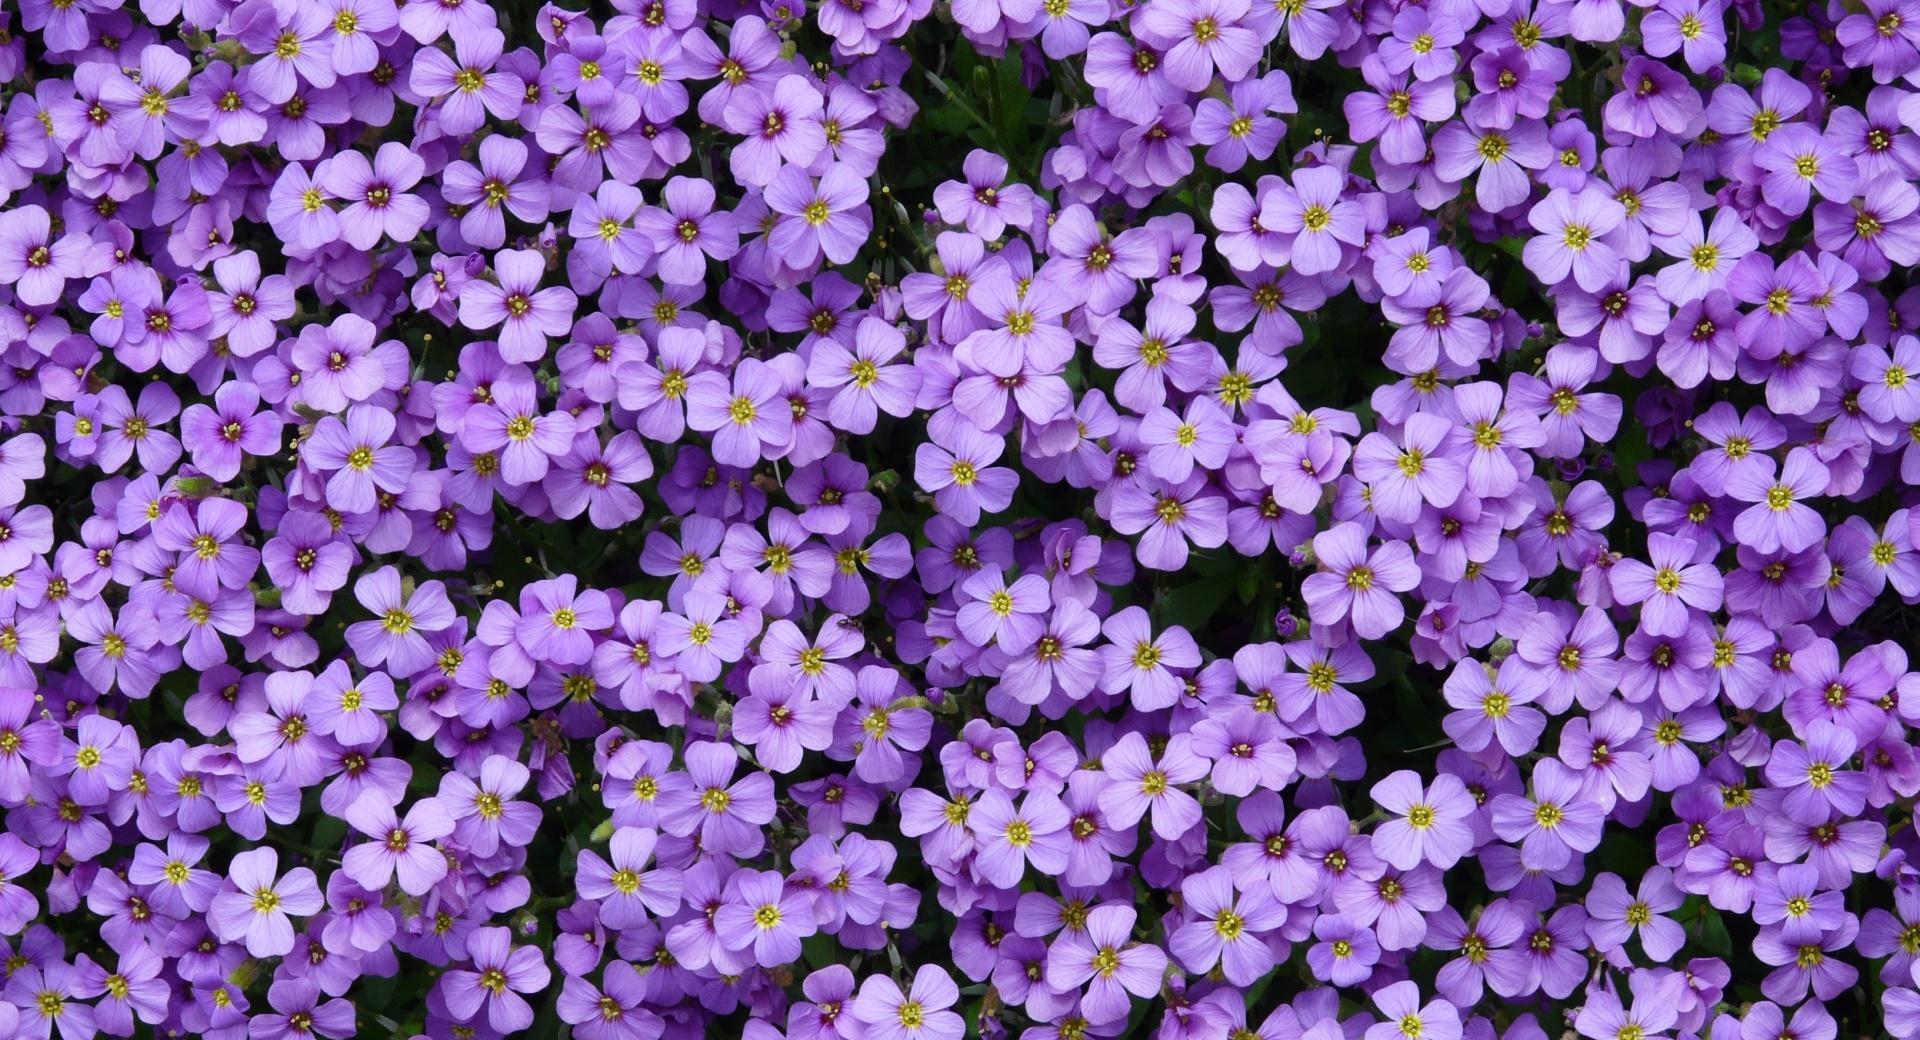 Aubrieta Flowers wallpapers HD quality